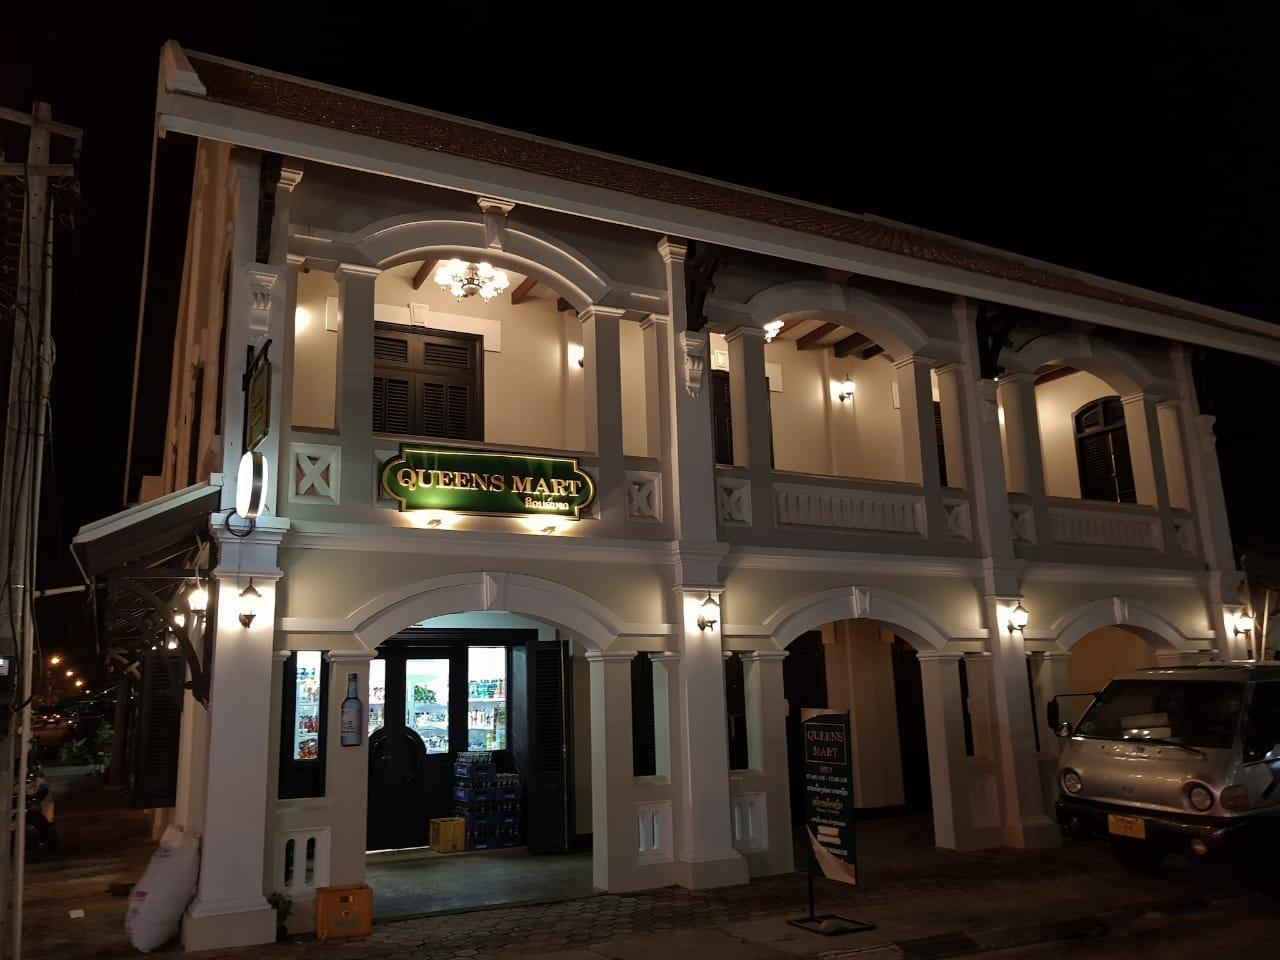 10 best savannakhet hotels hd photos reviews of hotels in rh agoda com